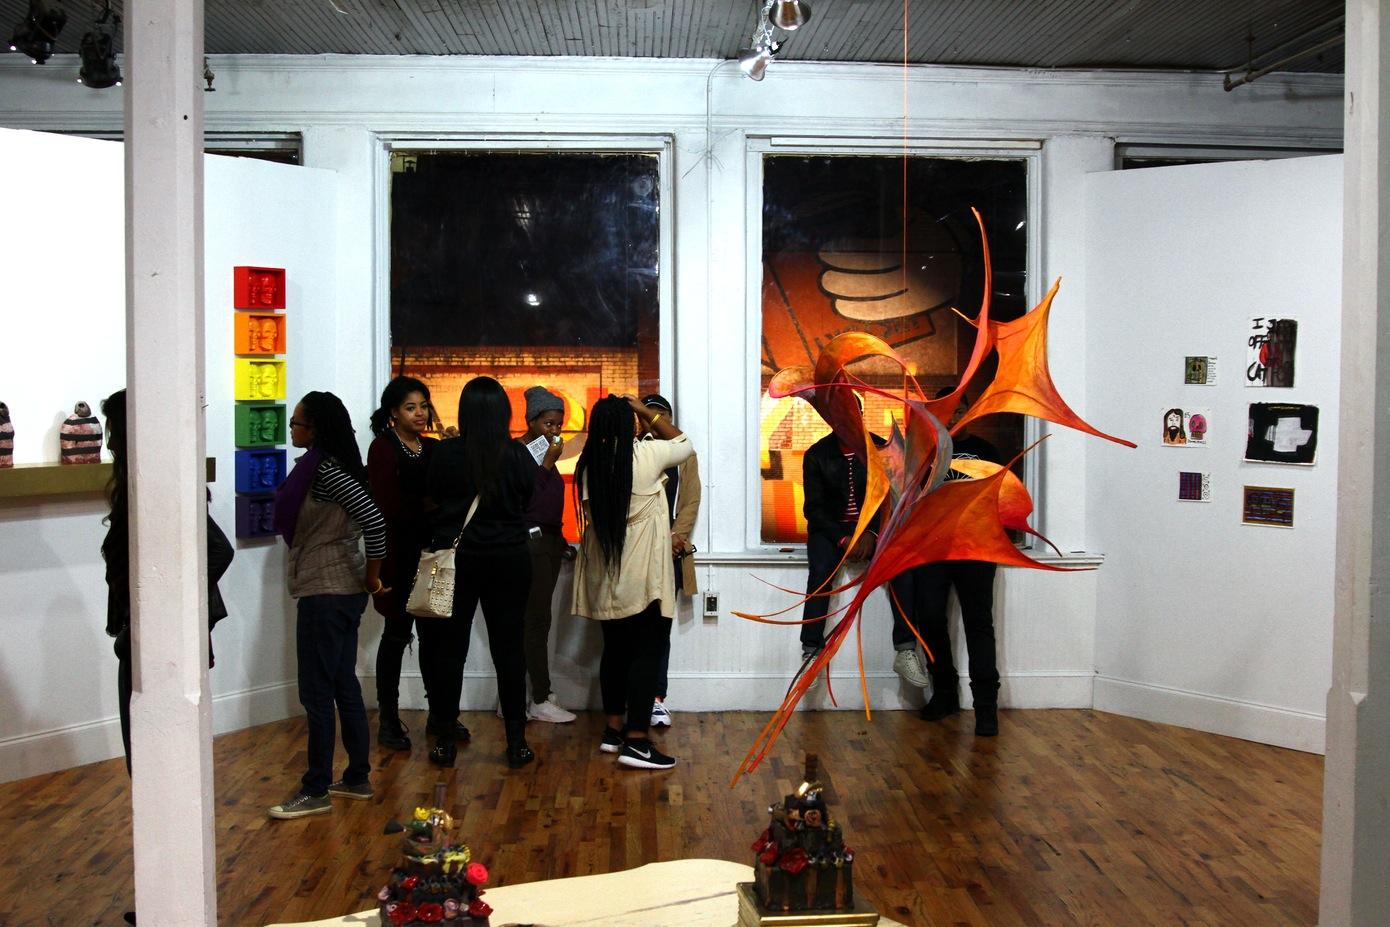 onthegrid.city/atlanta/south-downtown/mammal-gallery/